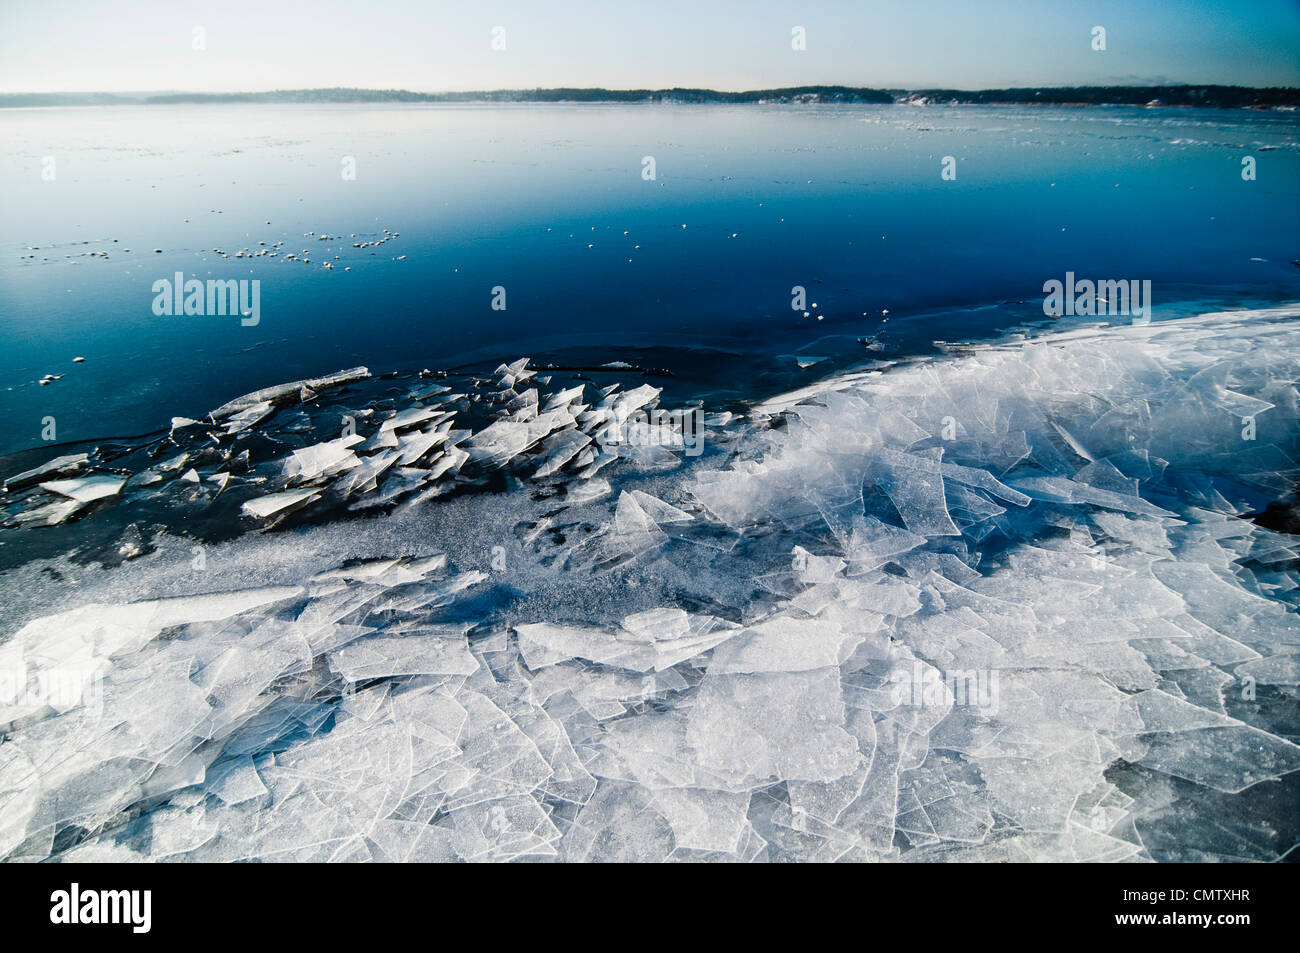 Broken ice - Stock Image